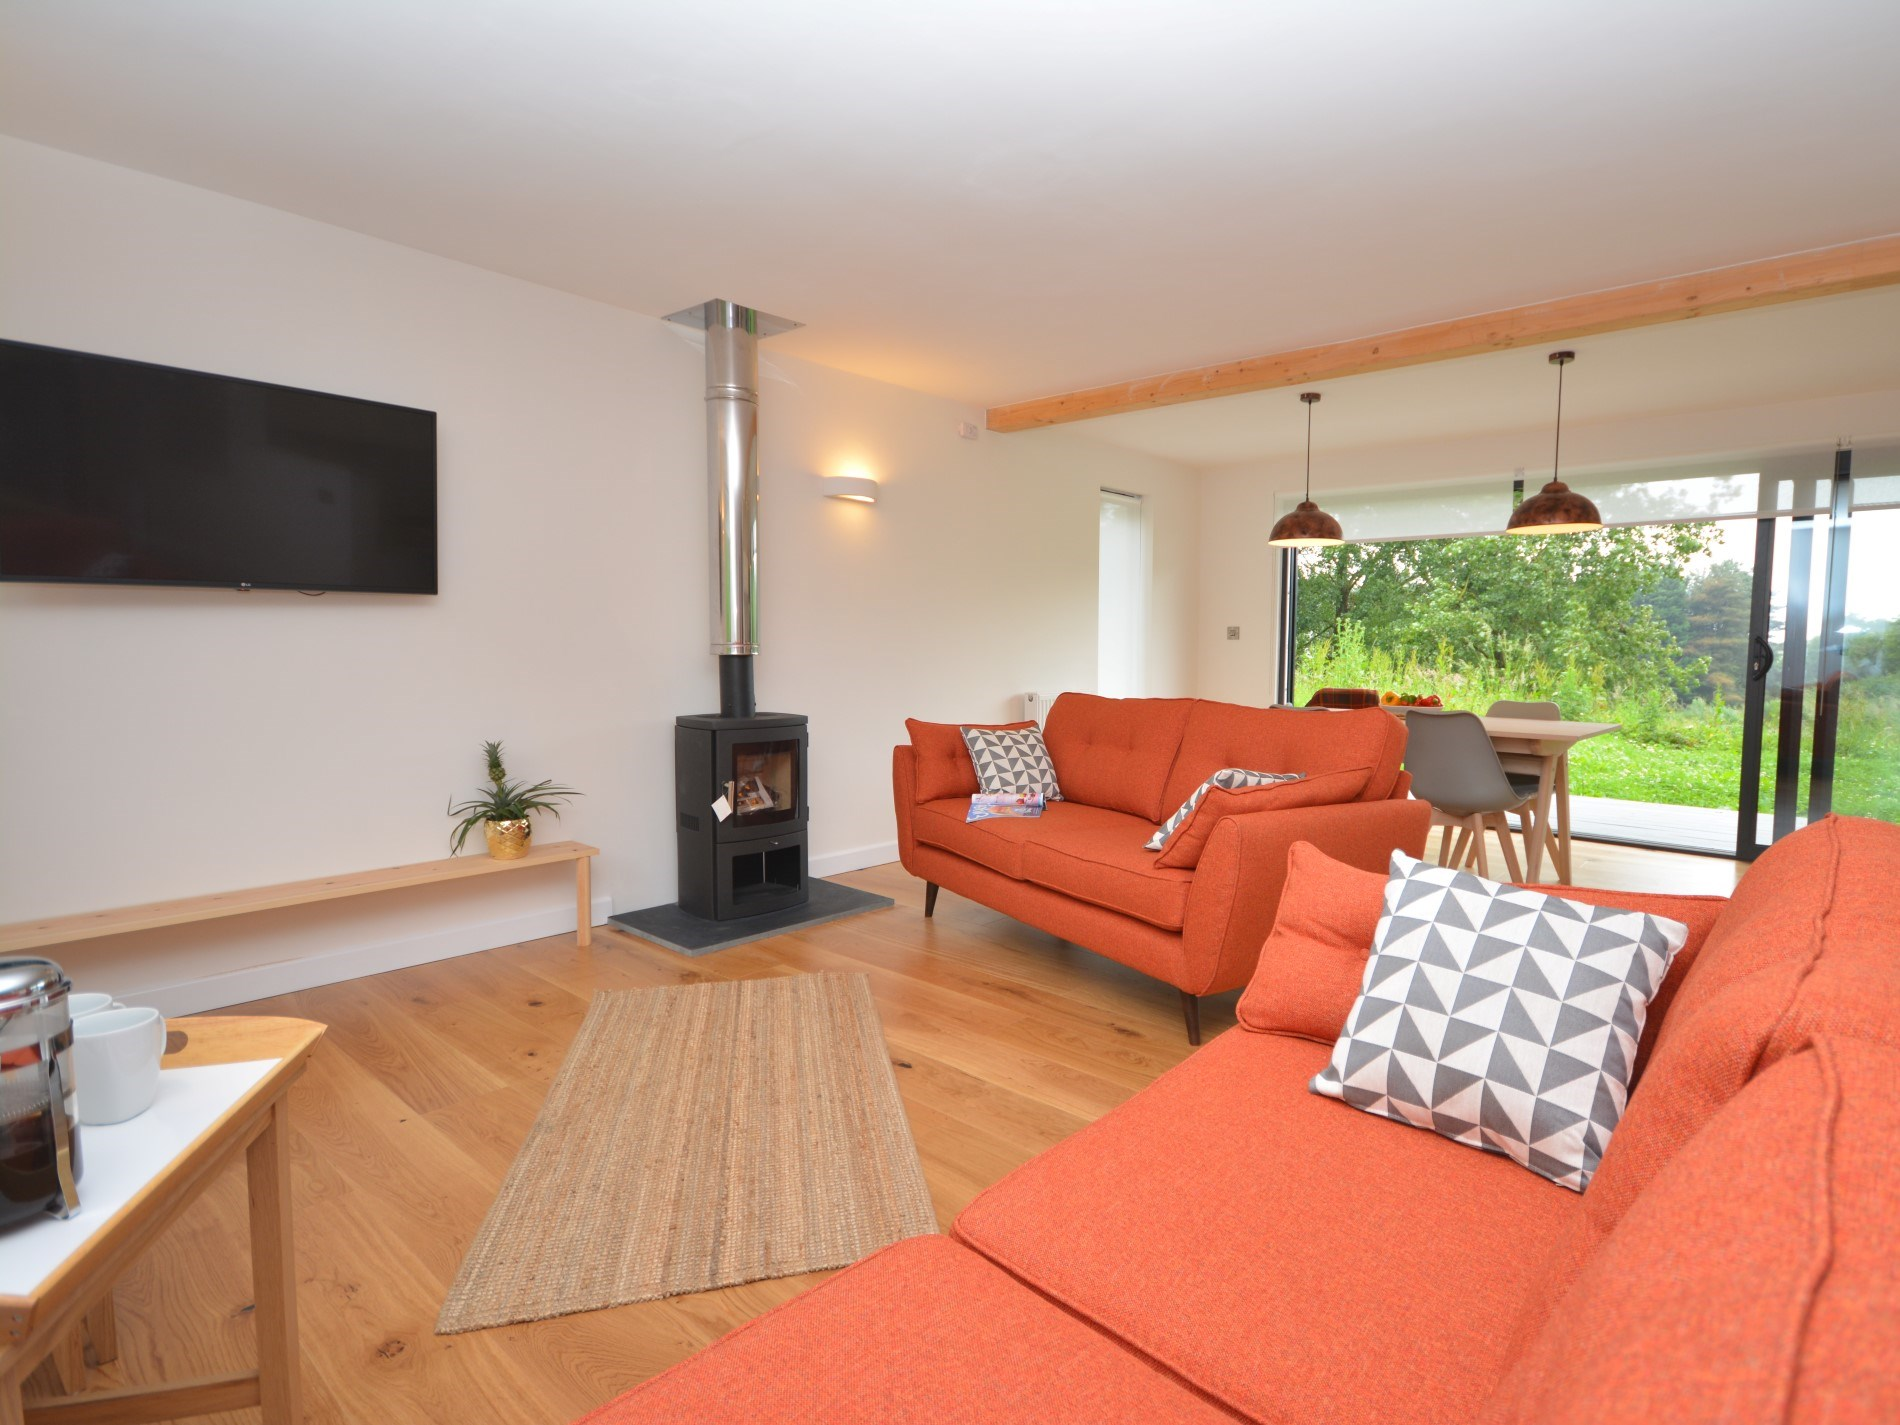 2 Bedroom Cottage in Tiverton, Devon